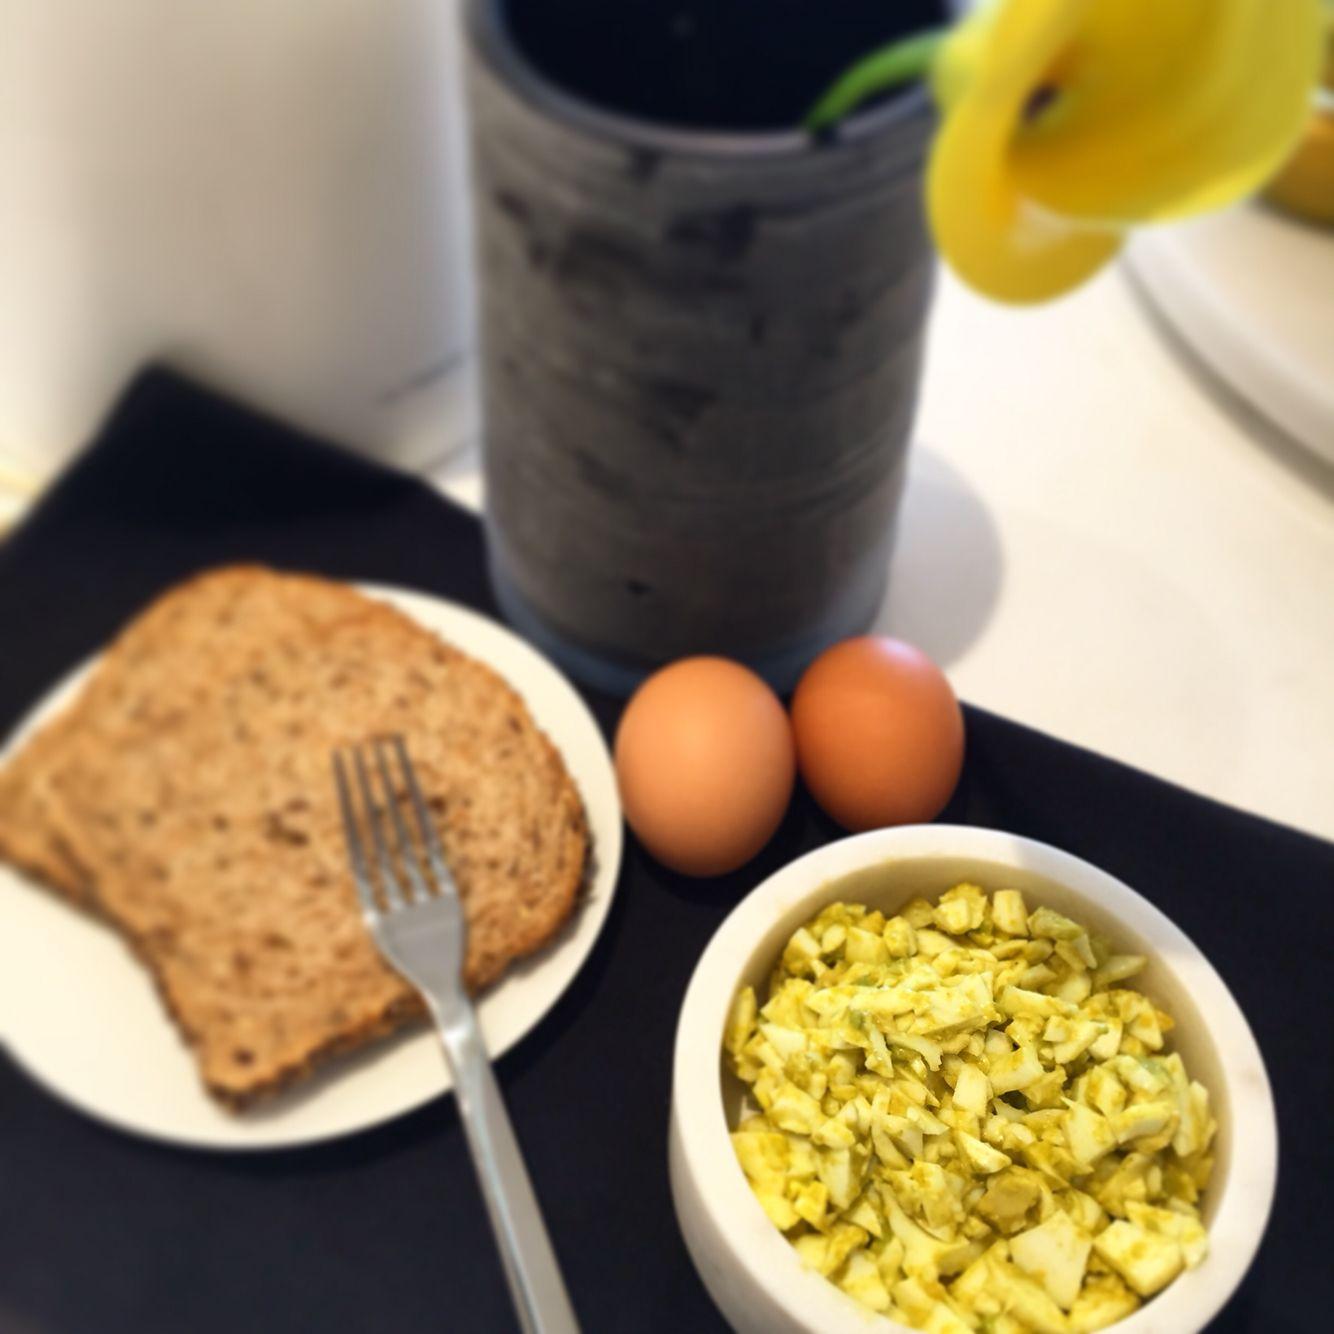 Egg salad with hint of turmeric and avocado wwwolistikah